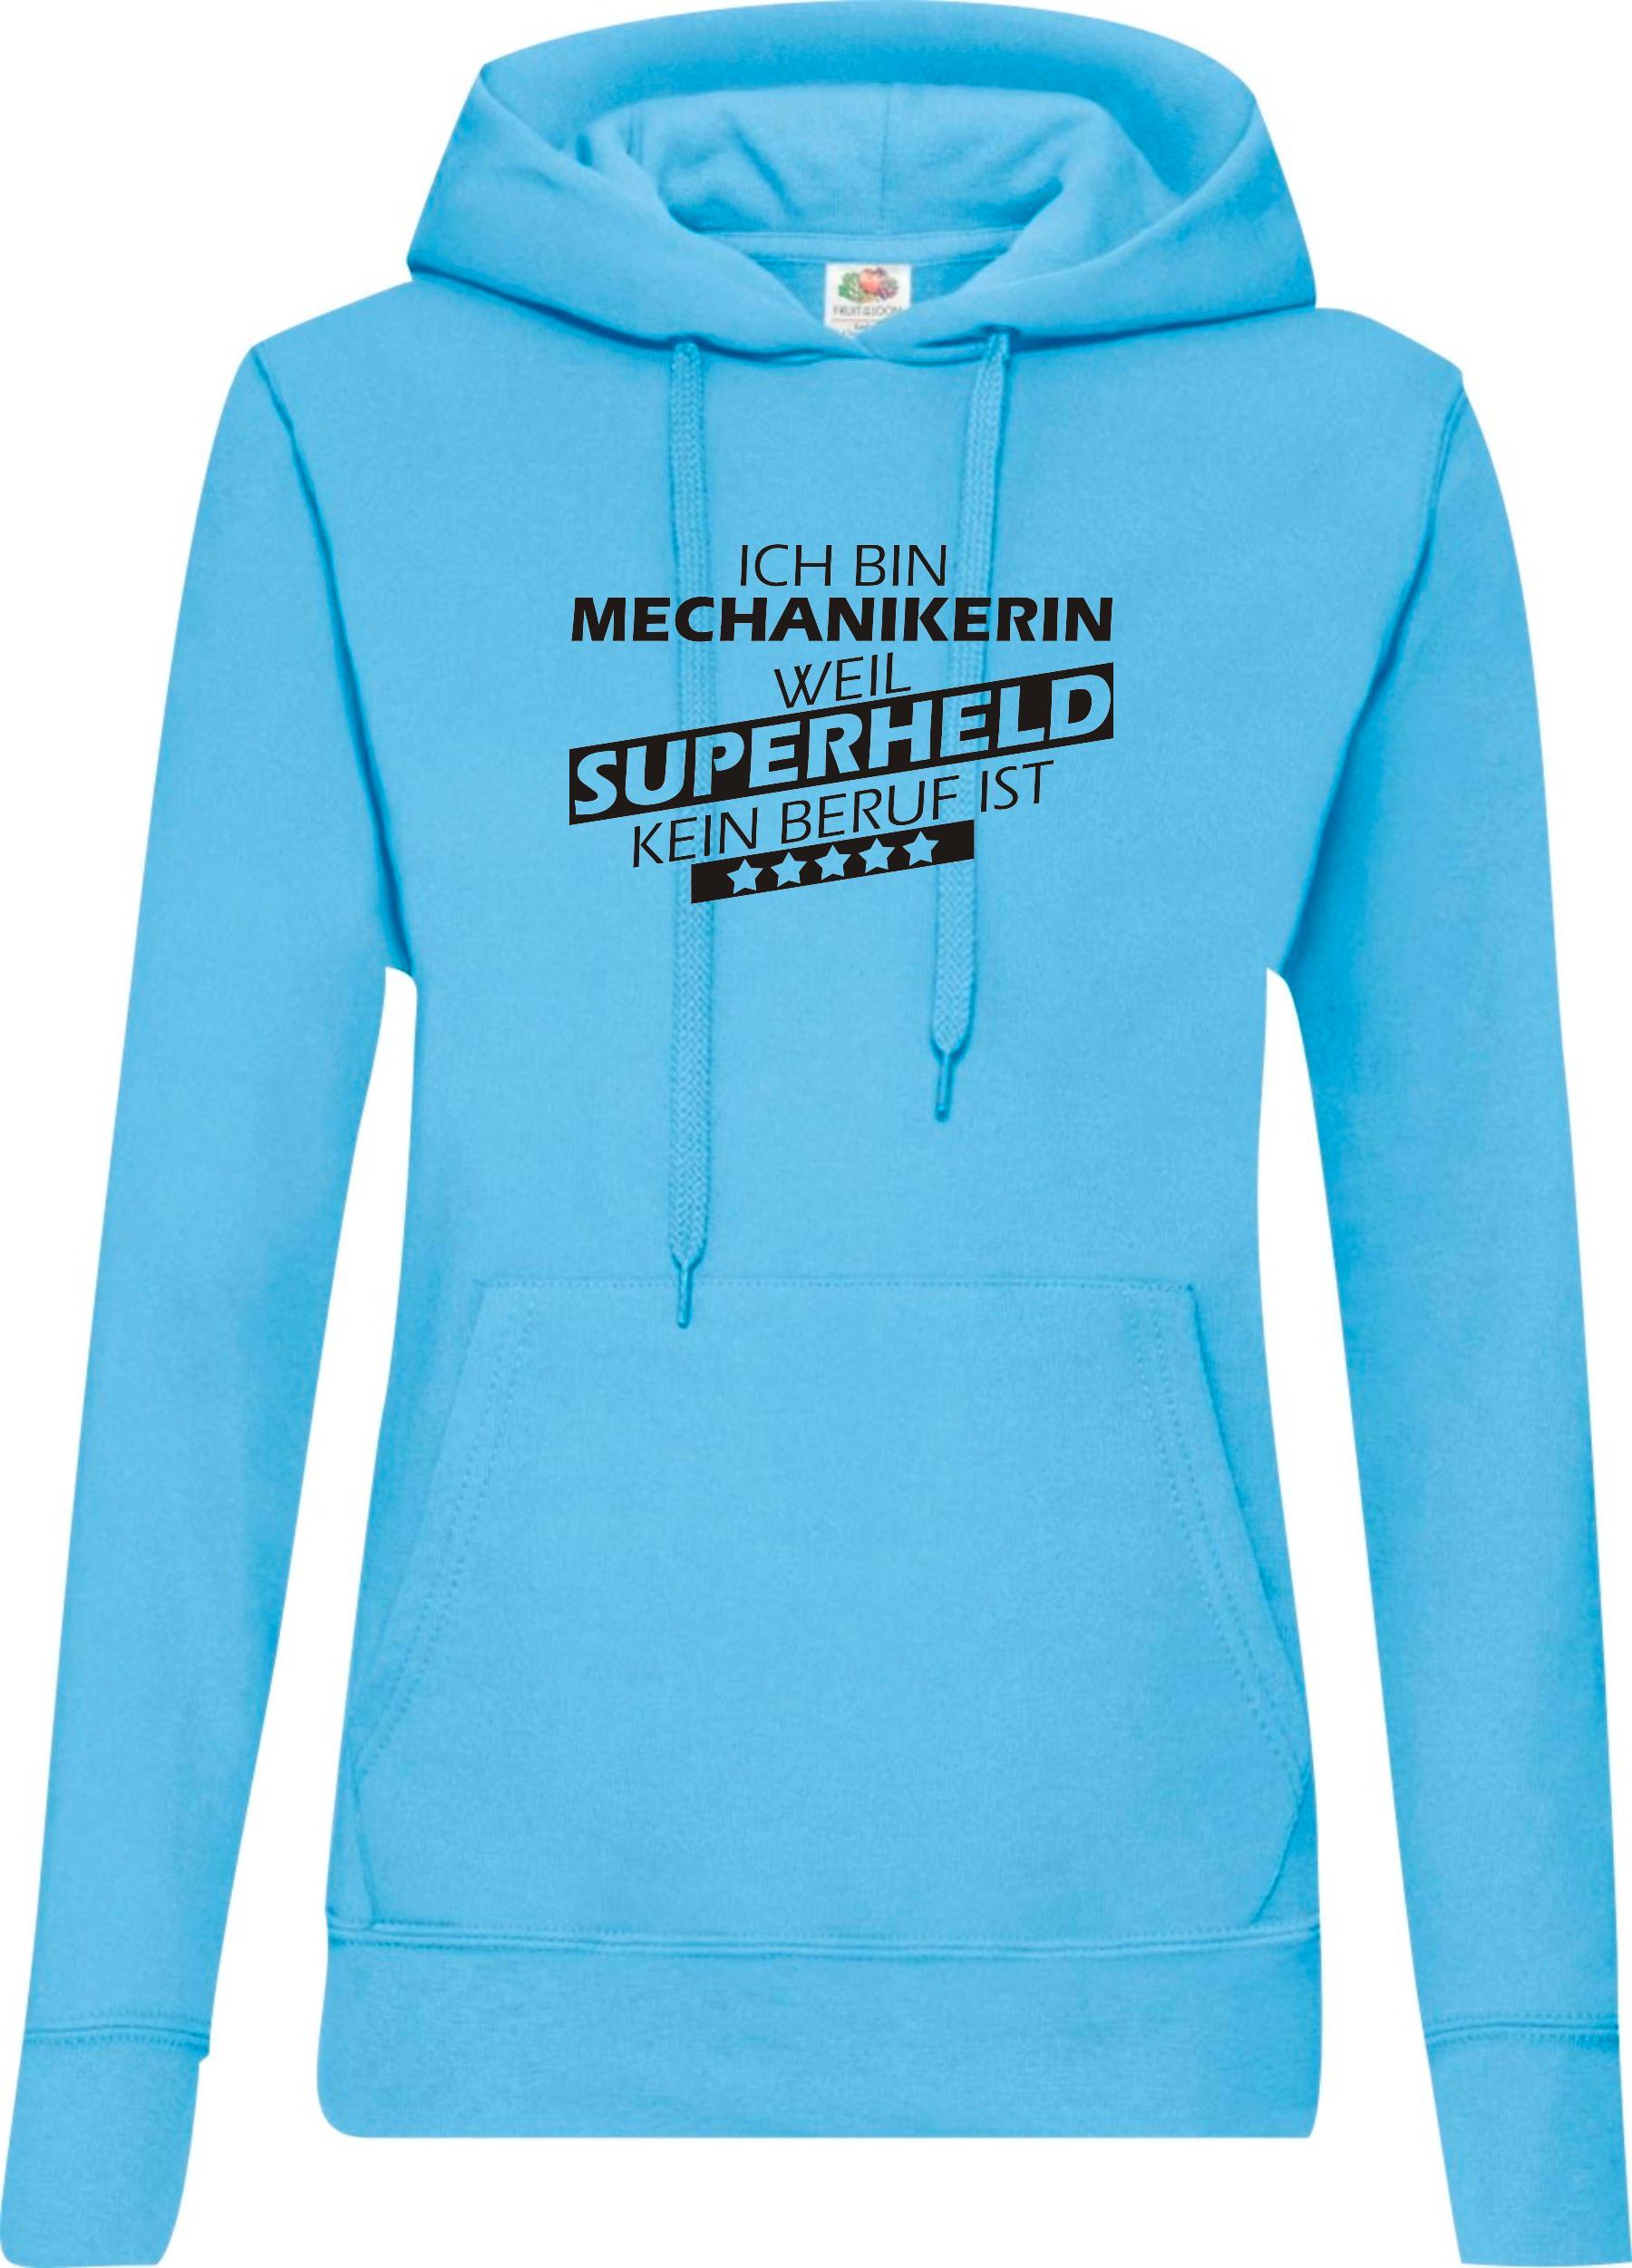 Lady-Kapuzensweatshirt-Ich-bin-Mechanikerin-weil-Superheld-kein-Beruf-ist-Groess